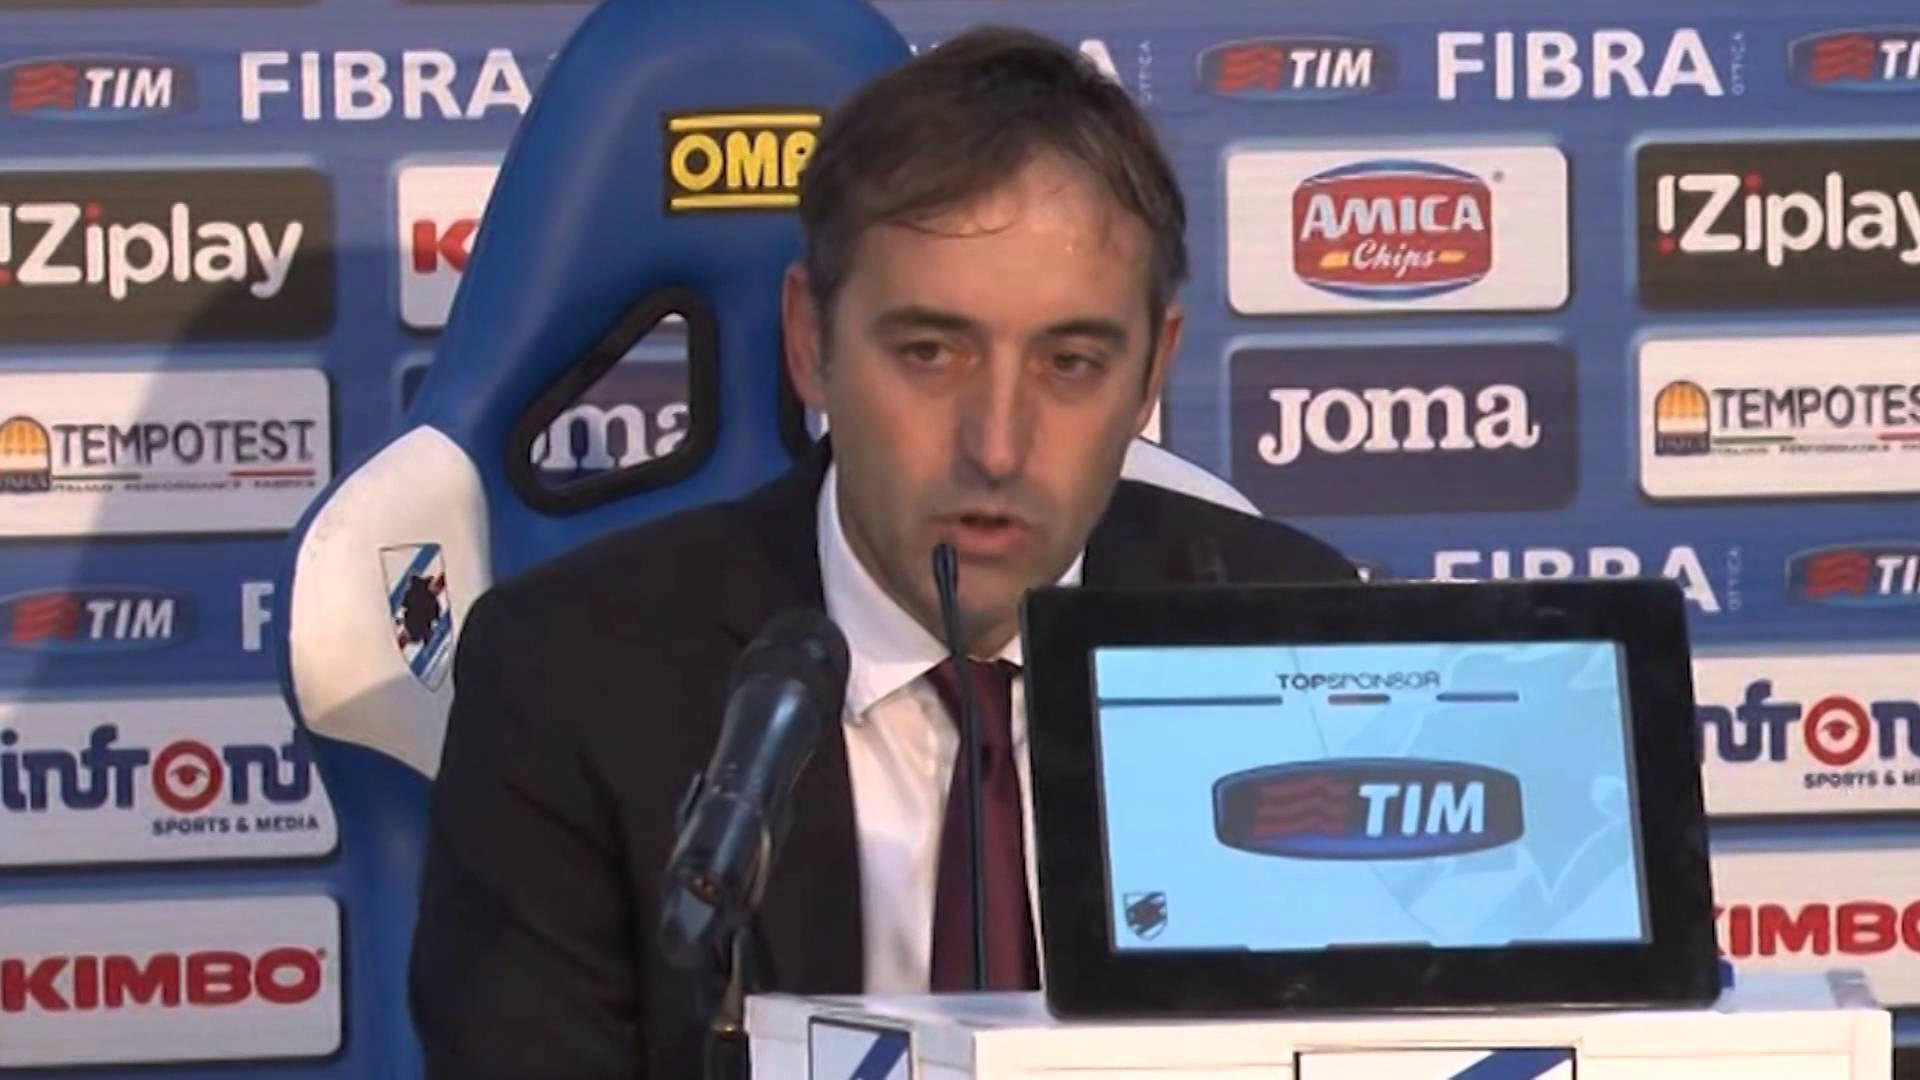 Palermo-Sampdoria streaming - diretta tv, dove vederla